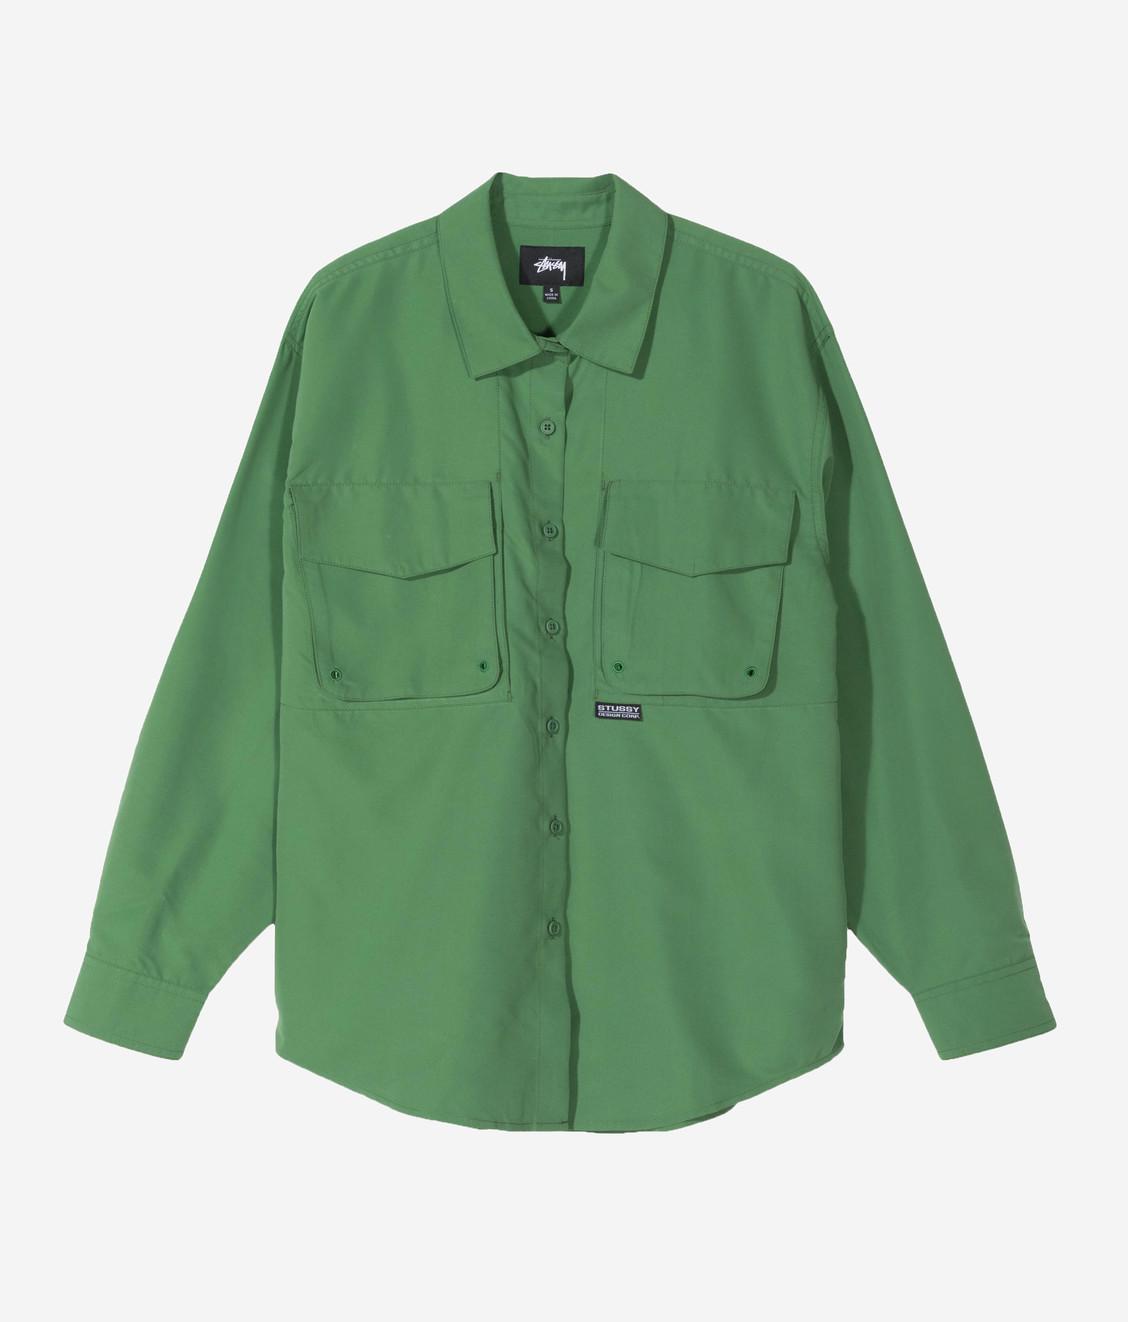 Stussy Stussy Range Outdoor LS Shirt Green